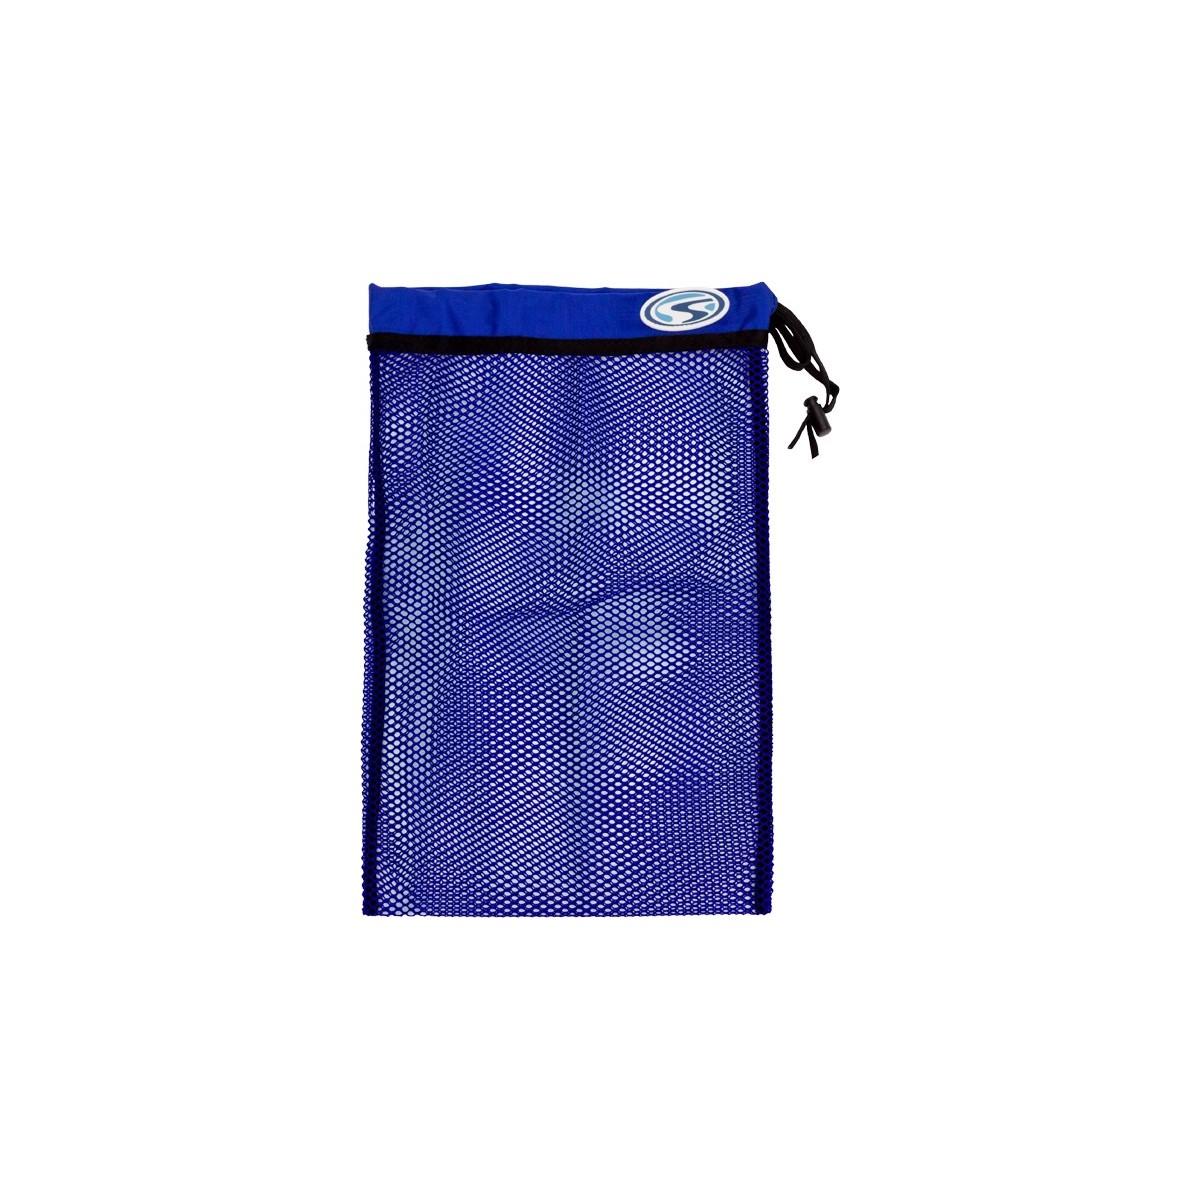 Stahlsac Small Flat Mesh Bag